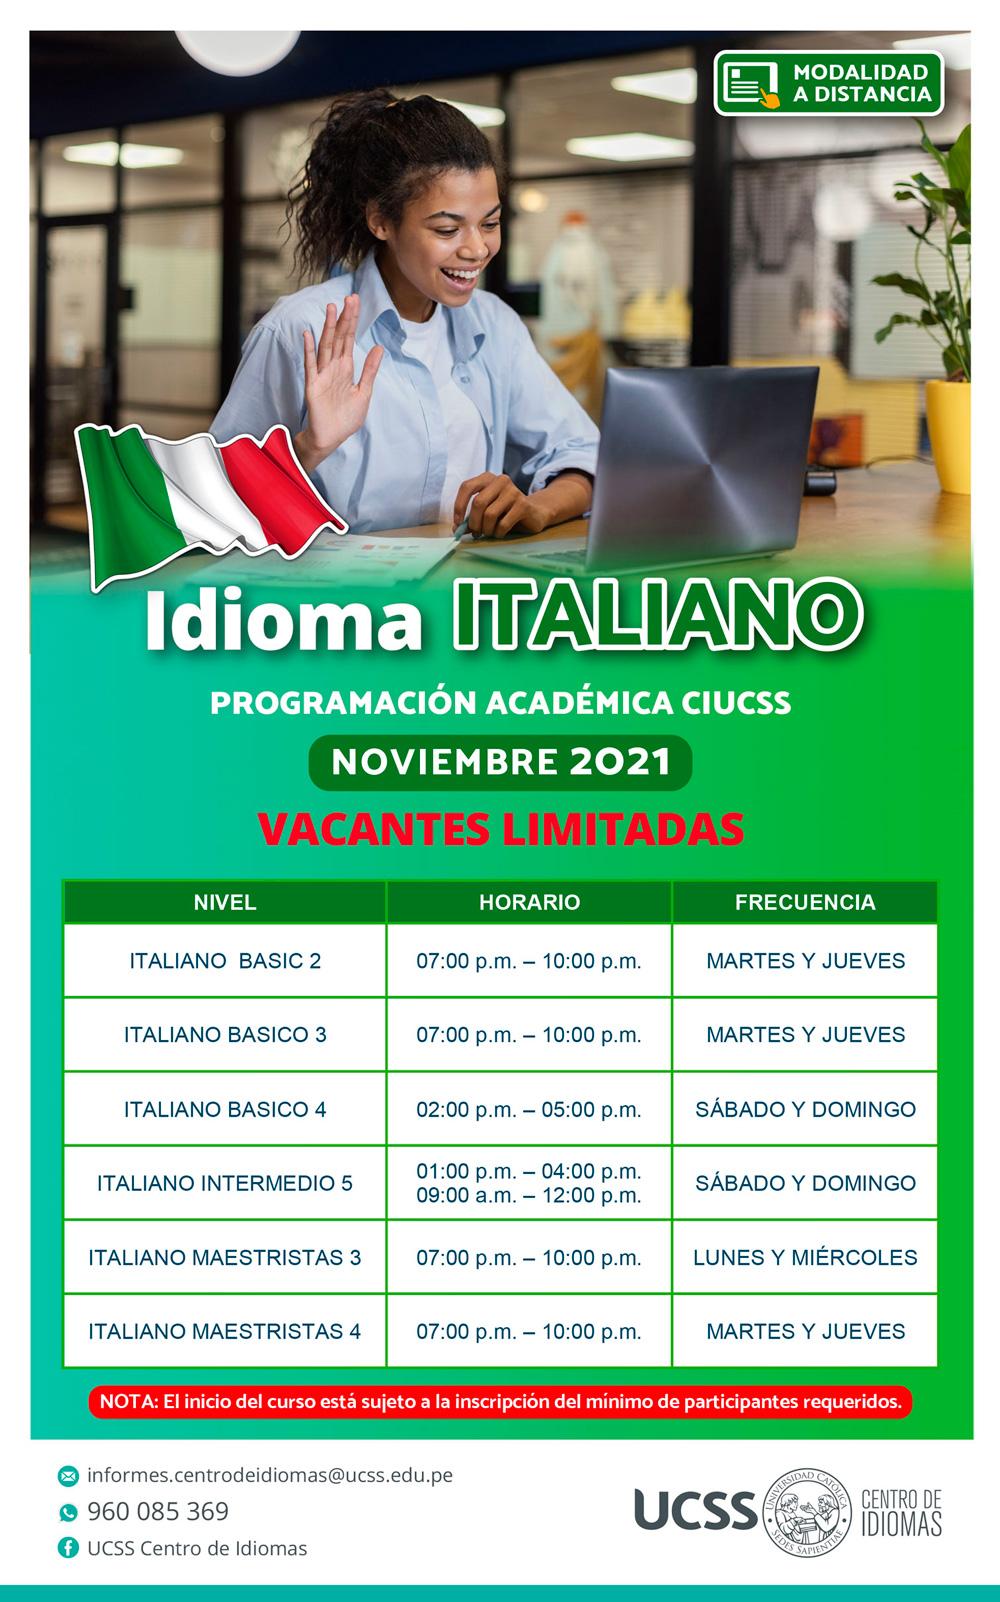 21-11-idioma-italiano-distancia-programacion-academica.jpg